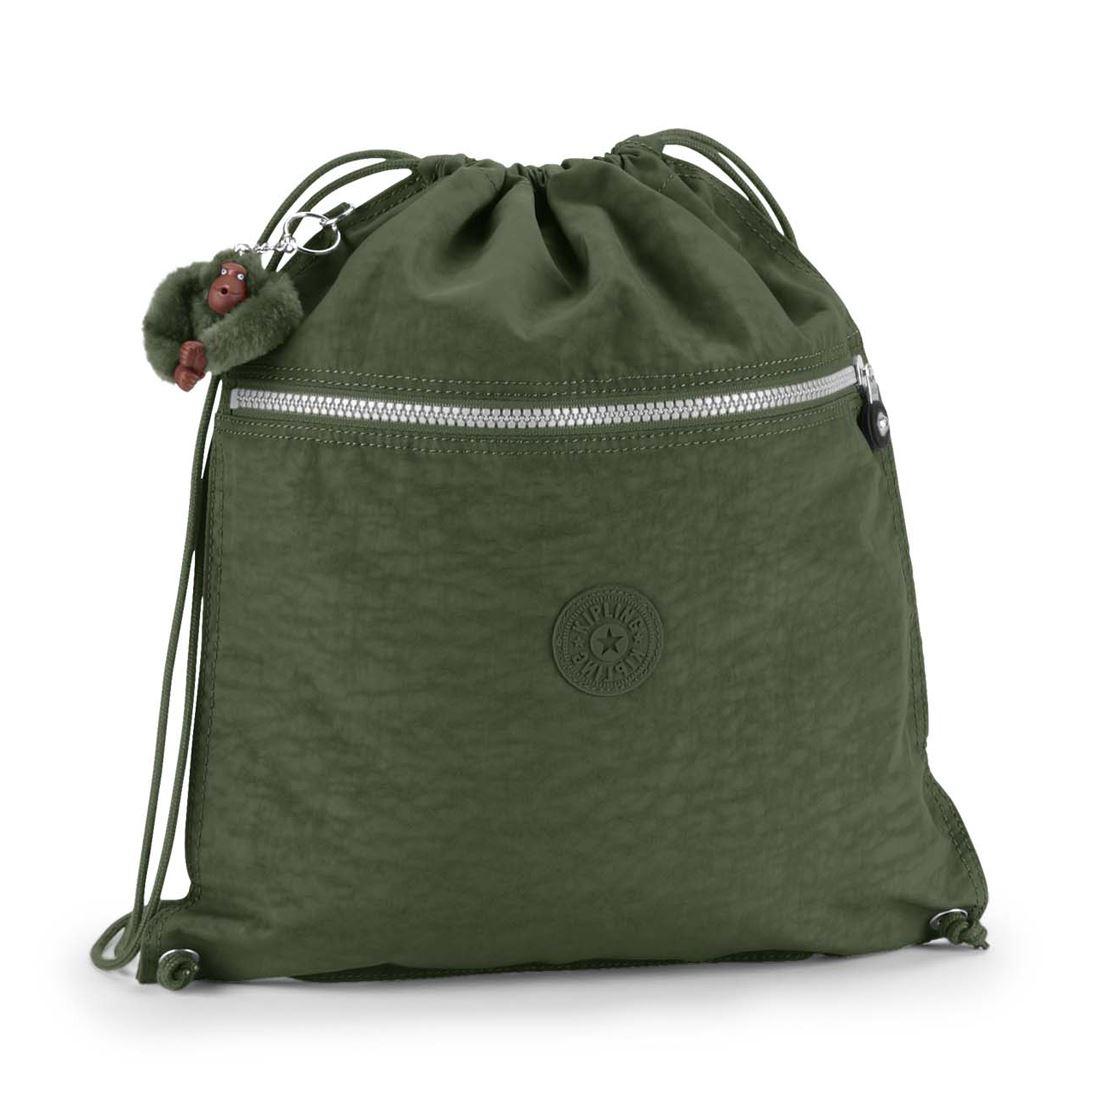 Kipling Supertaboo Traditional Drawstring Bag for School